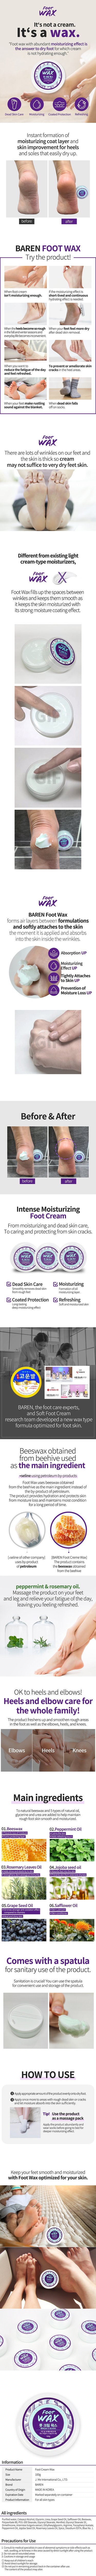 Foot Cream Wax. en.jpg